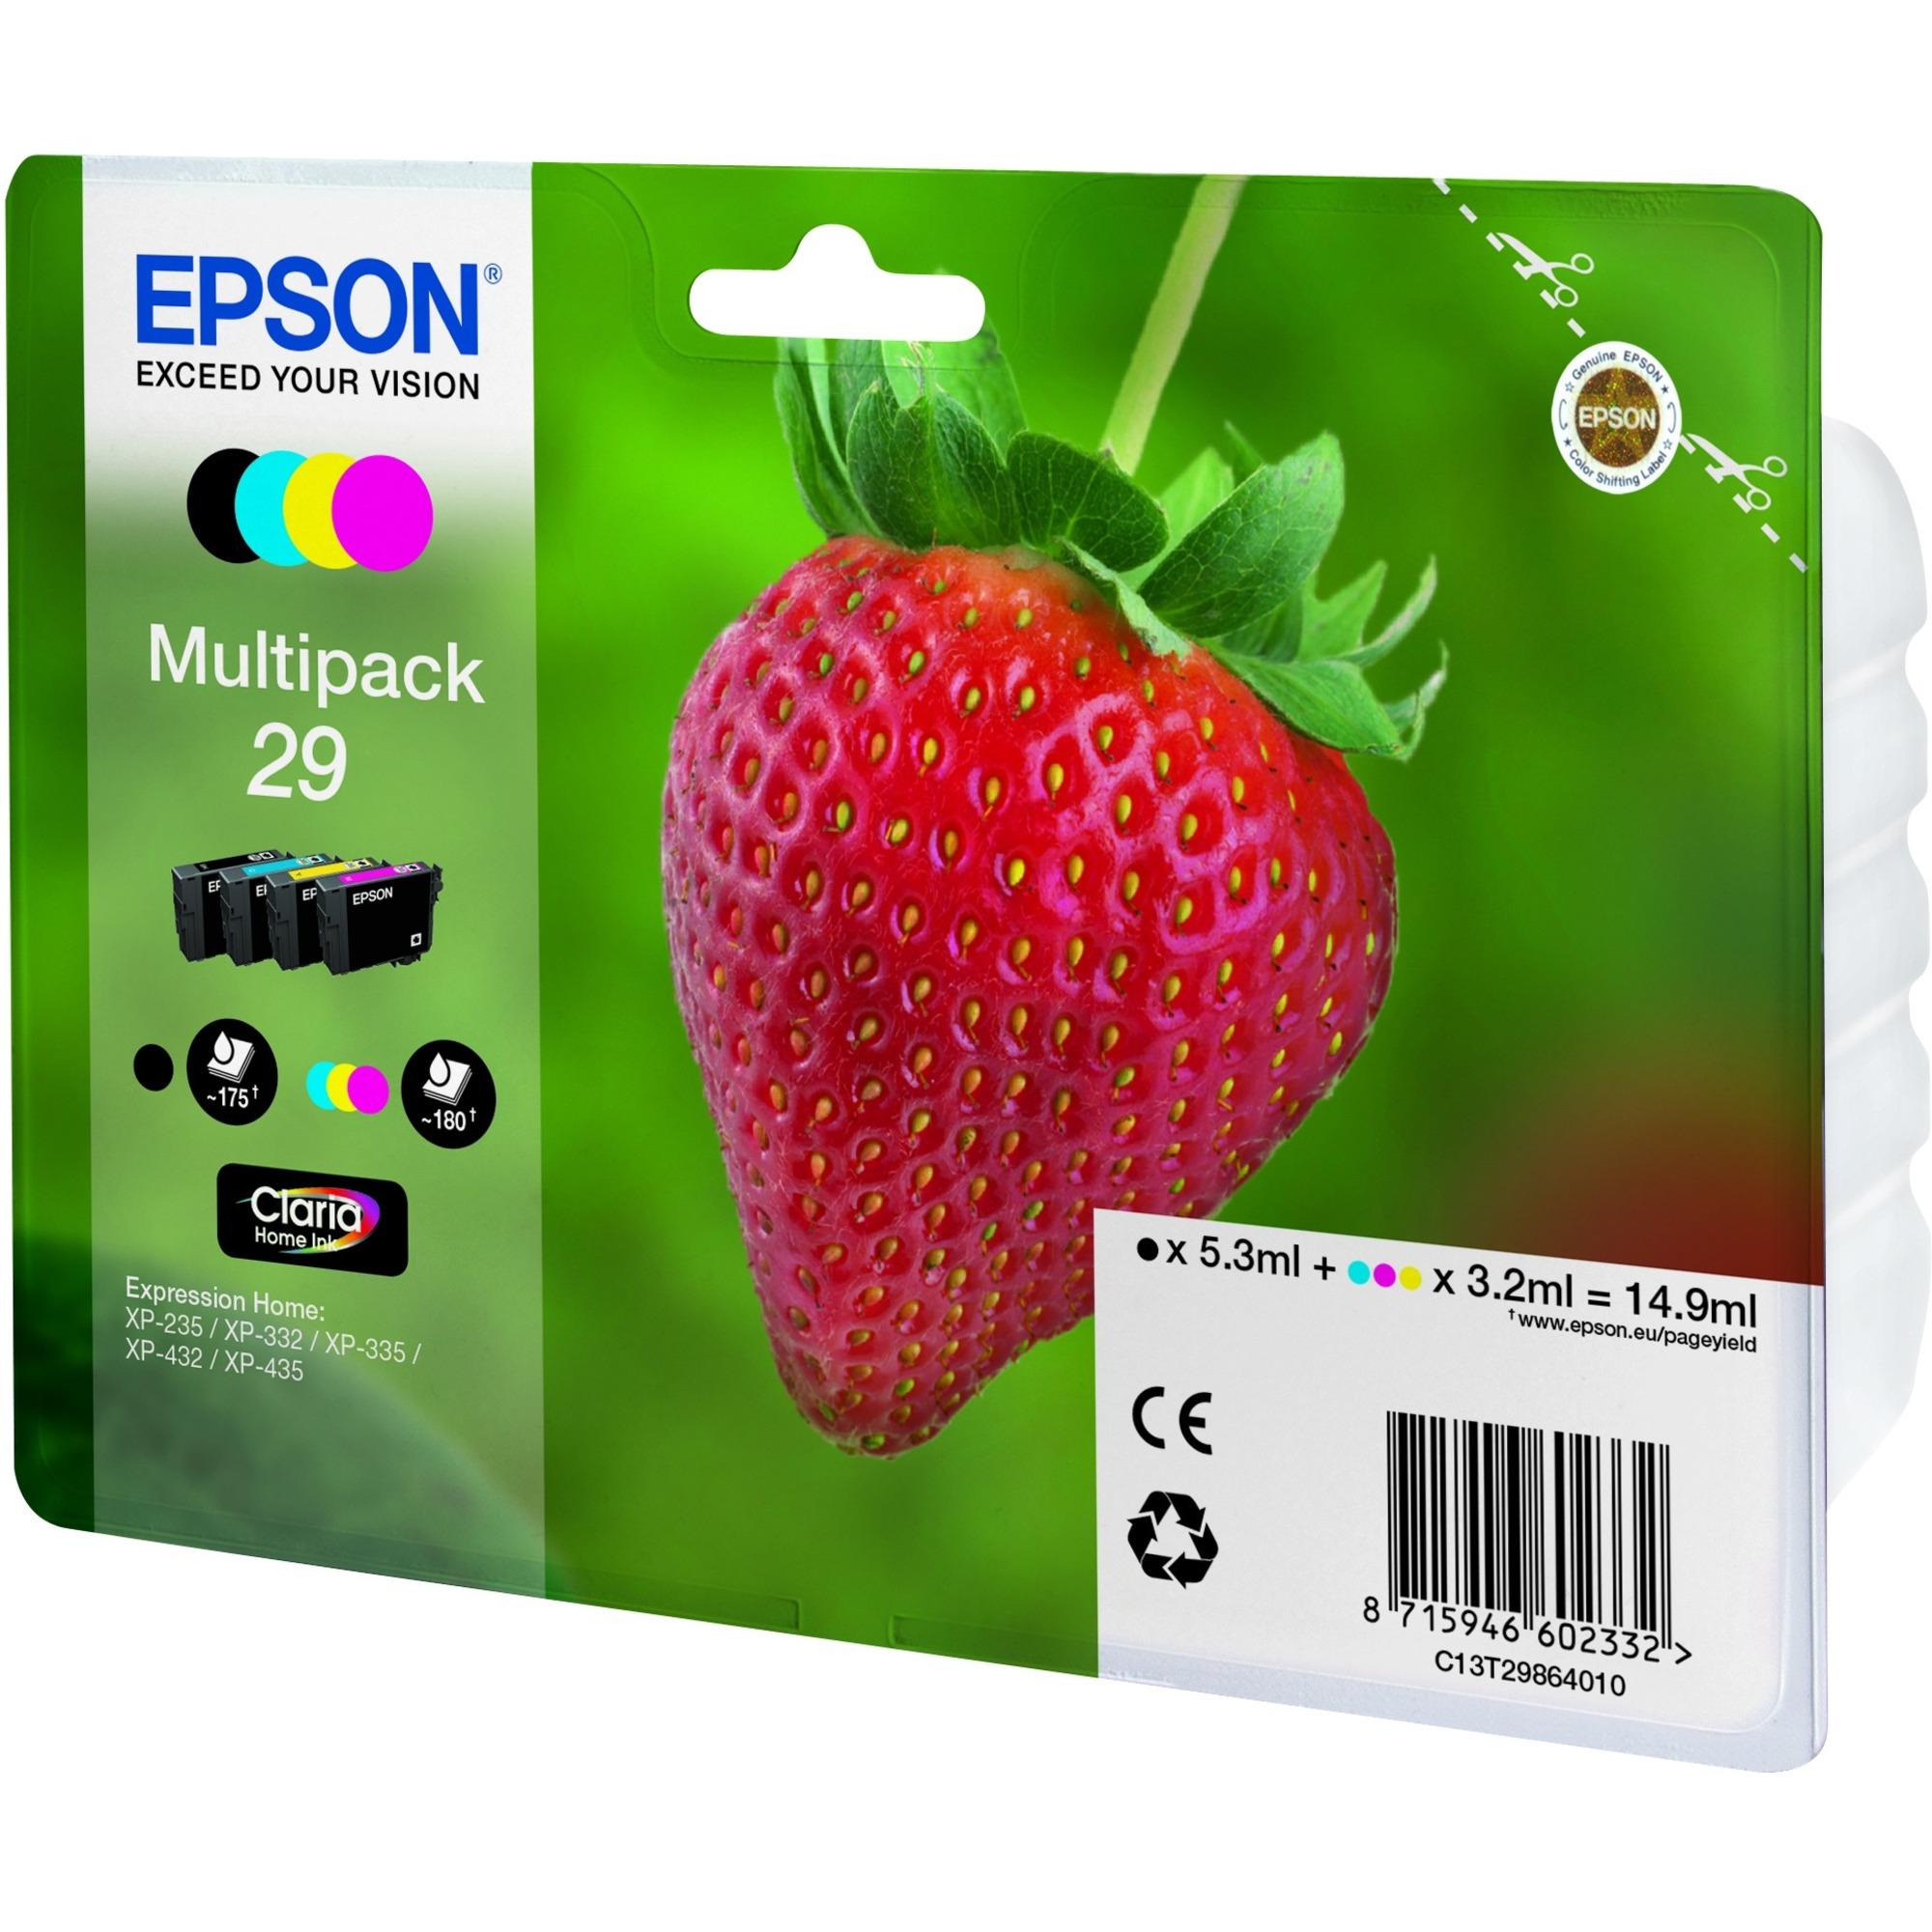 Epson Claria 29 Ink Cartridge - Black, Cyan, Yellow, Magenta - Inkjet - 180 Page - 4 / Pack - OEM